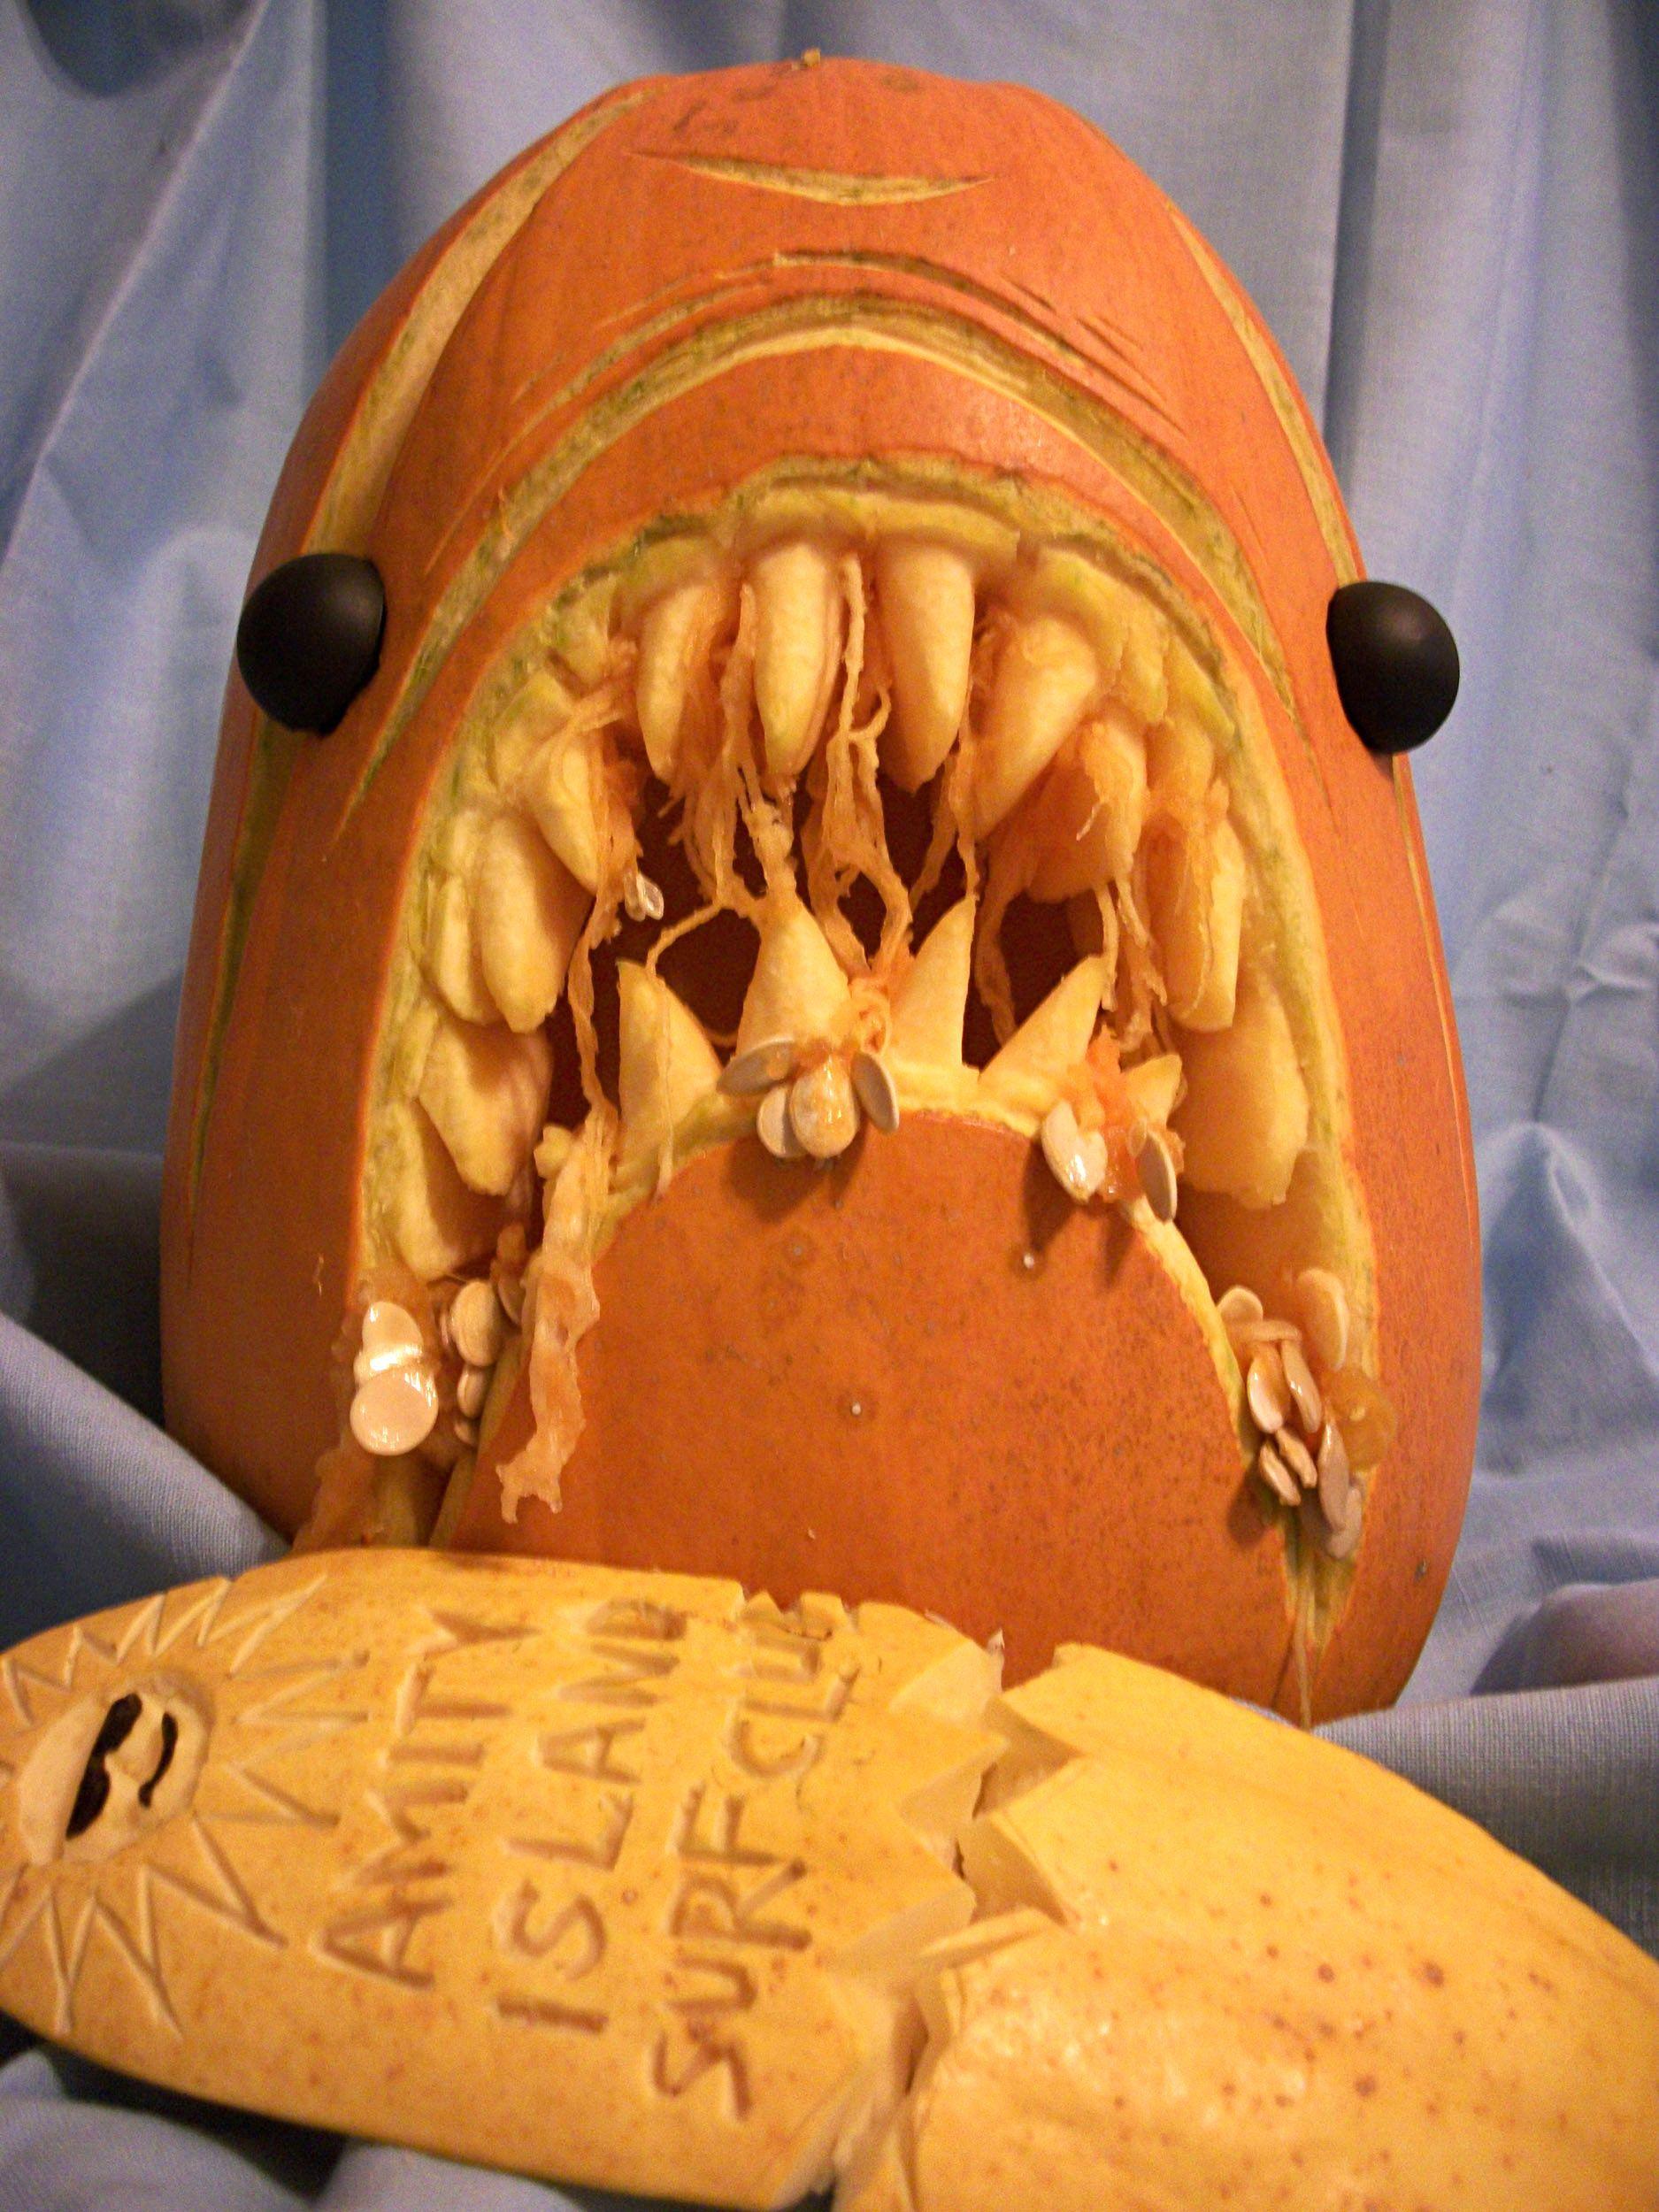 Shea creative pumpkin carving templates jaws shark